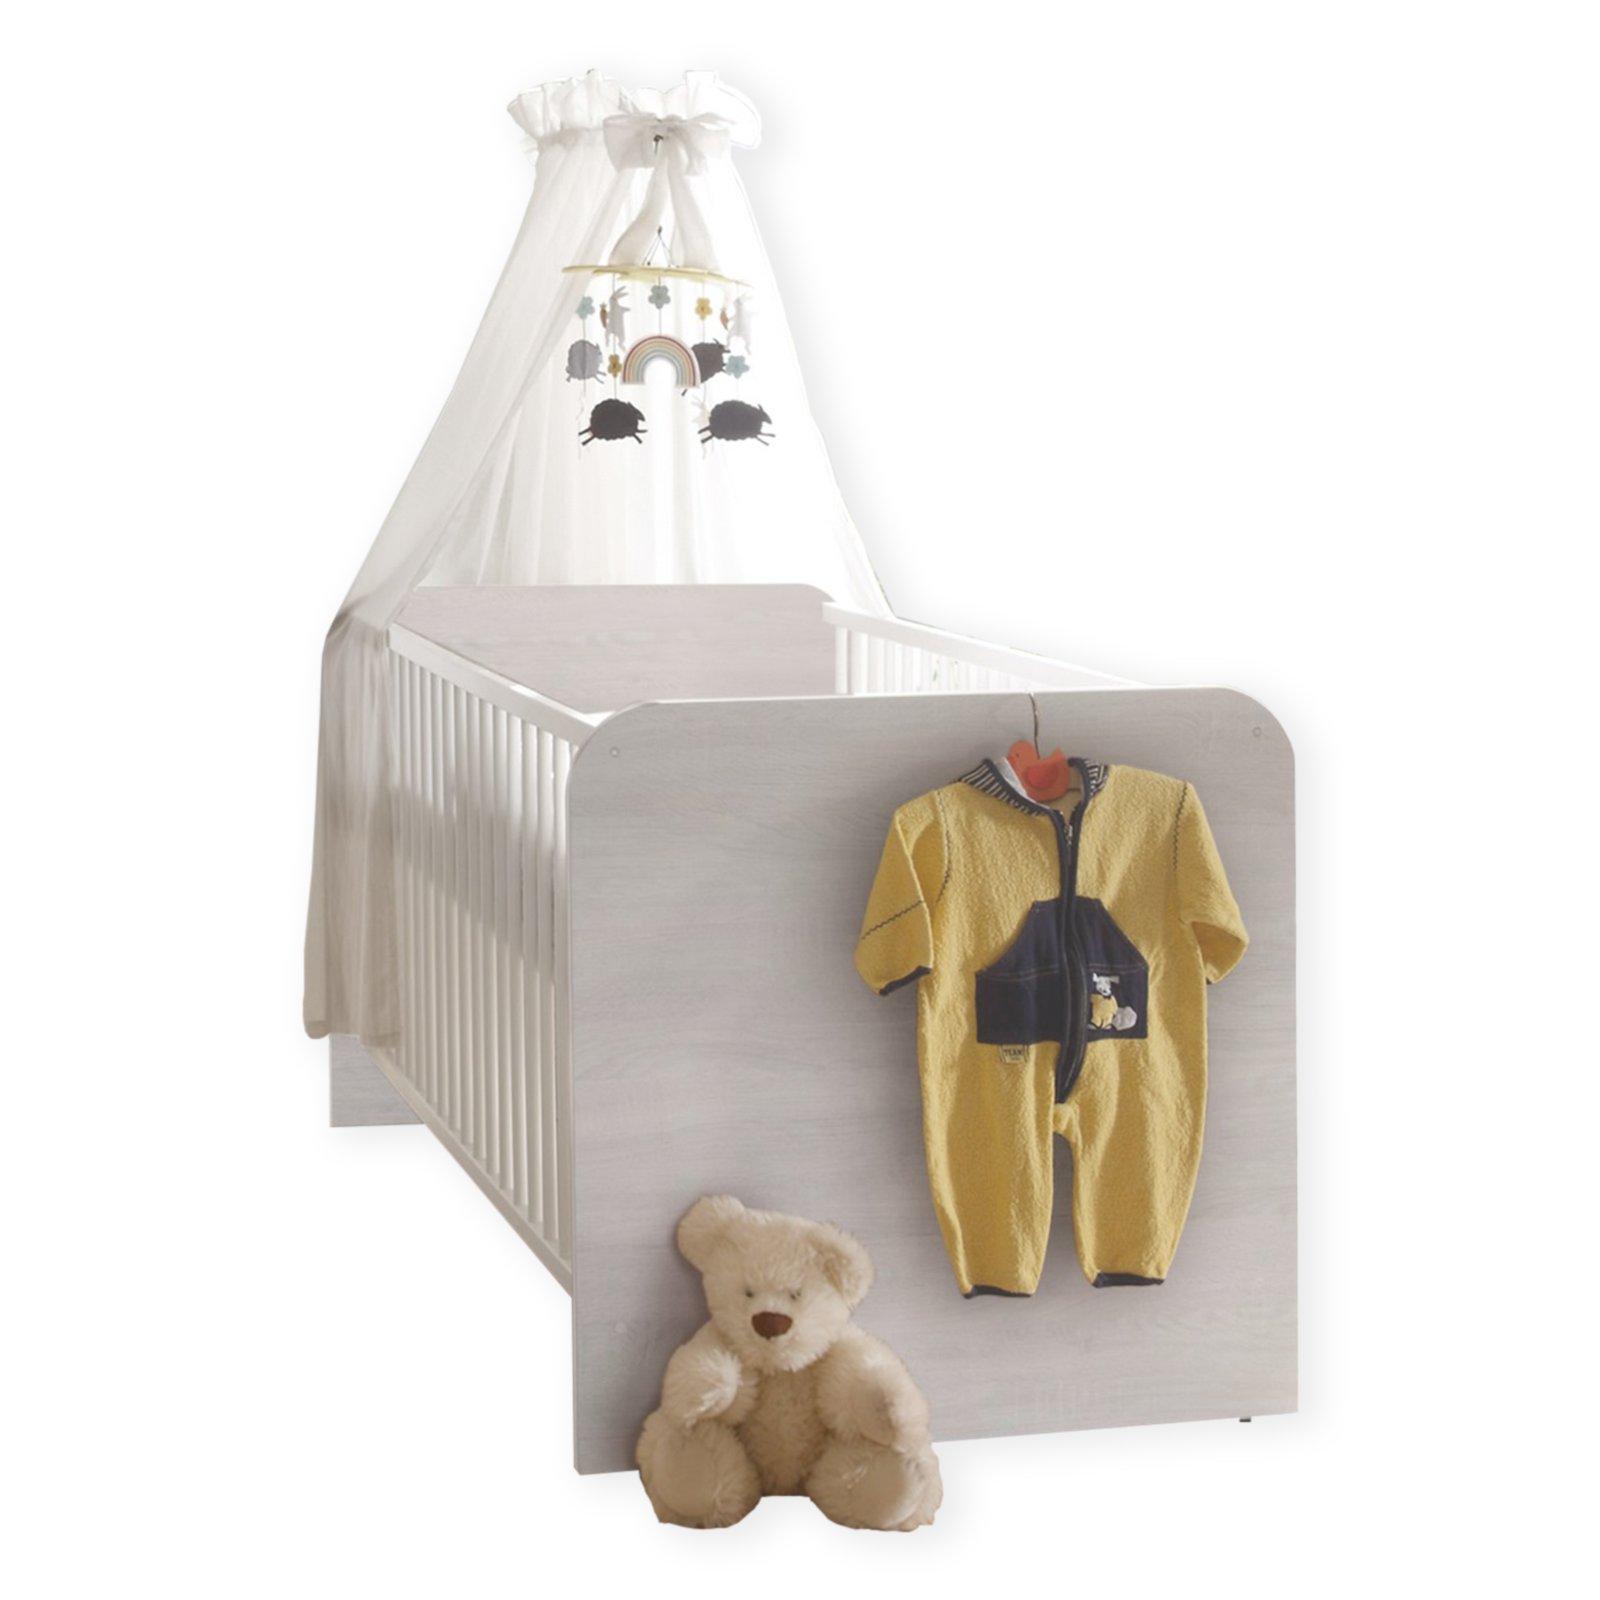 babybett luca pinie wei tr ffel 70x140 cm babybetten kinderbetten betten m bel. Black Bedroom Furniture Sets. Home Design Ideas